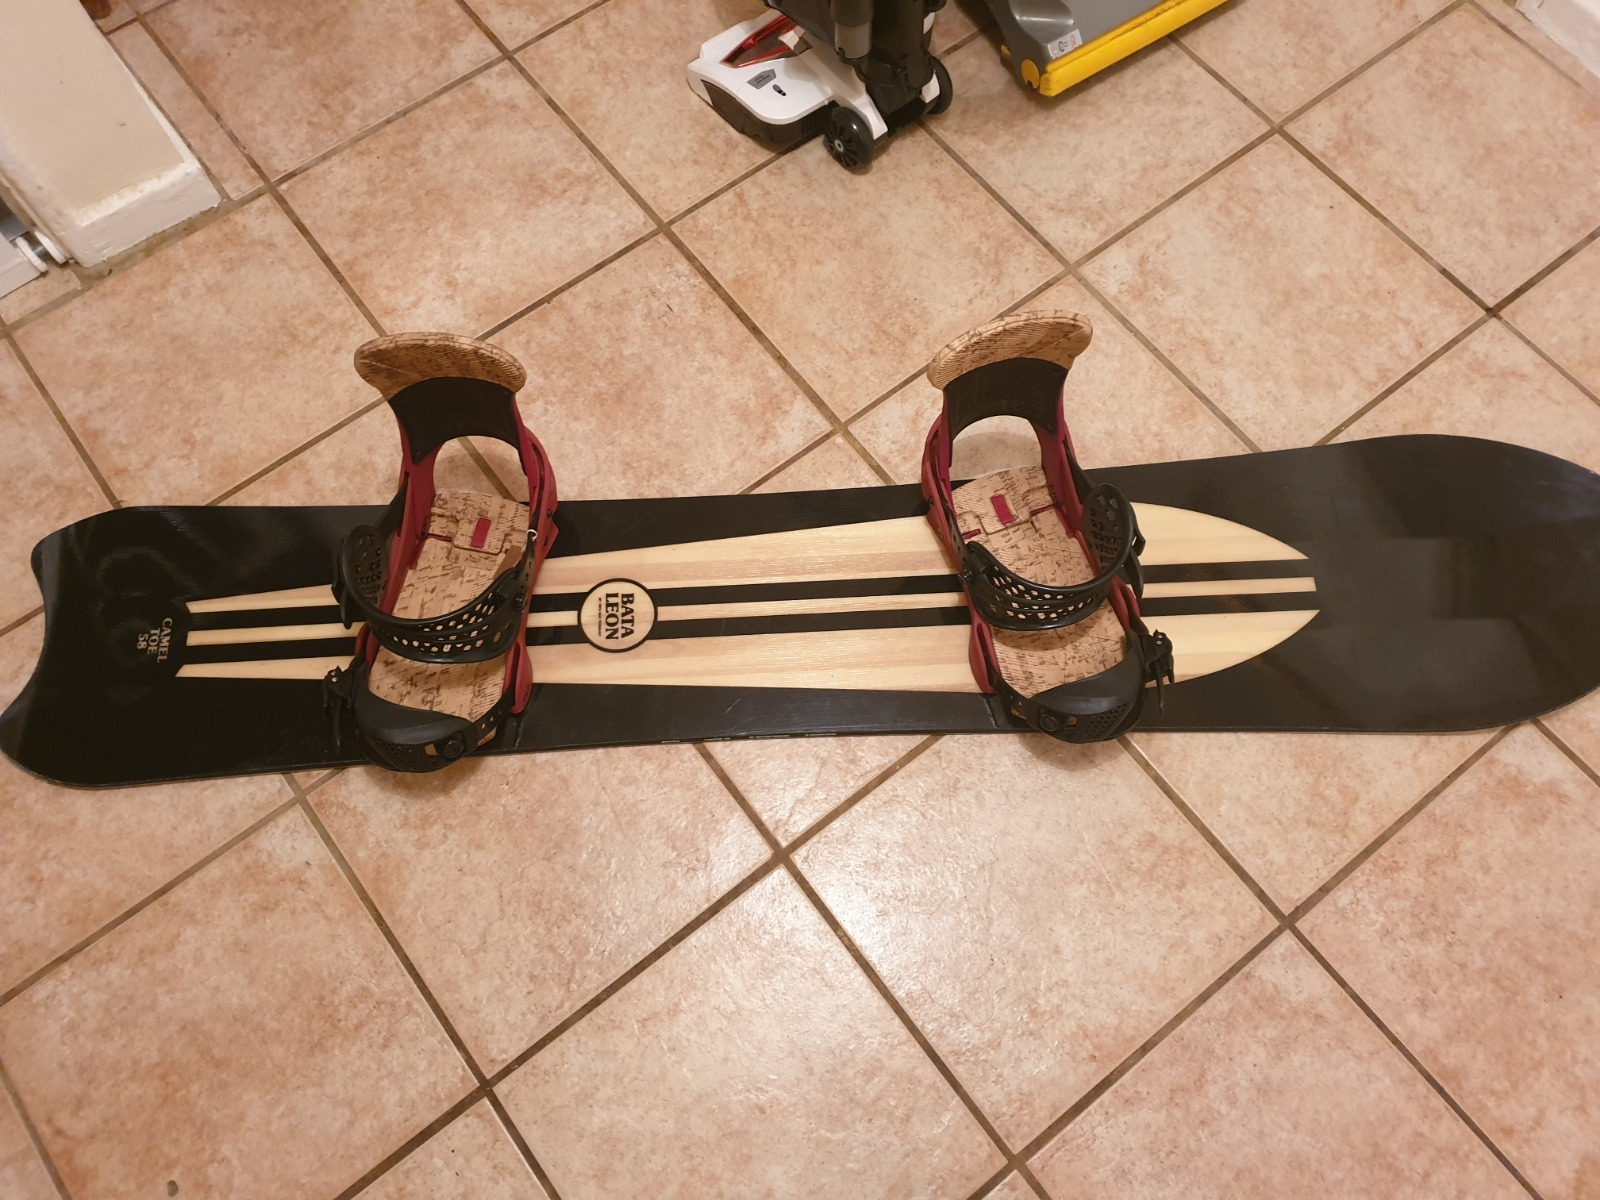 Battalion cameltoe snowboard